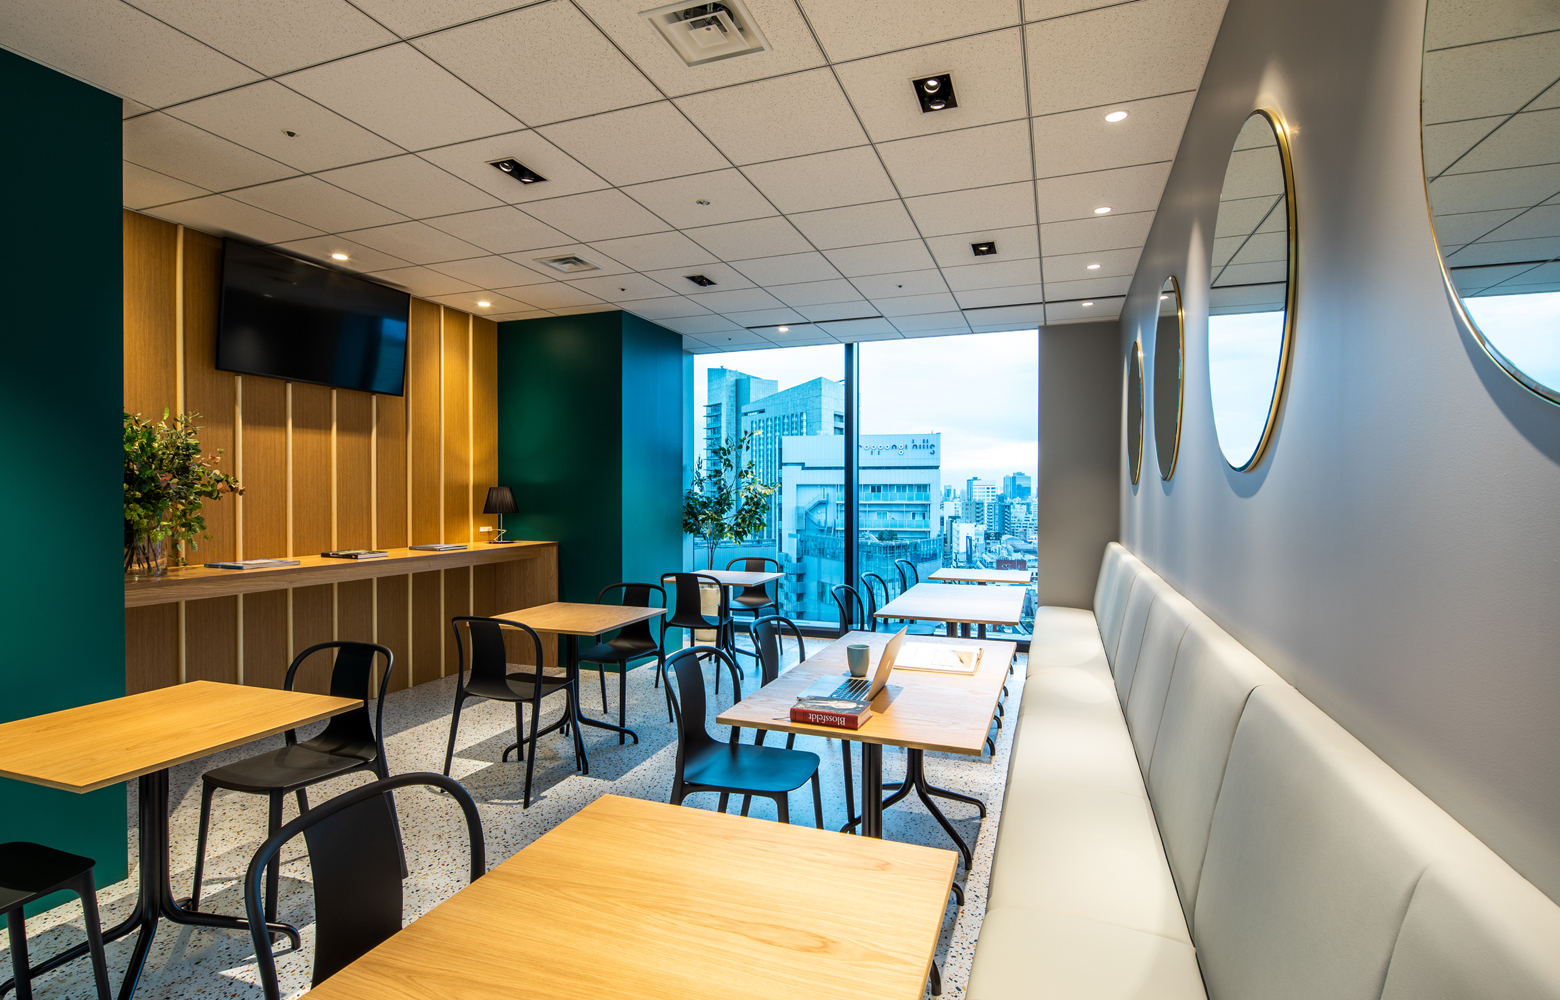 KLab株式会社 Roppongi Office Refresh Space_2 デザイン・レイアウト事例